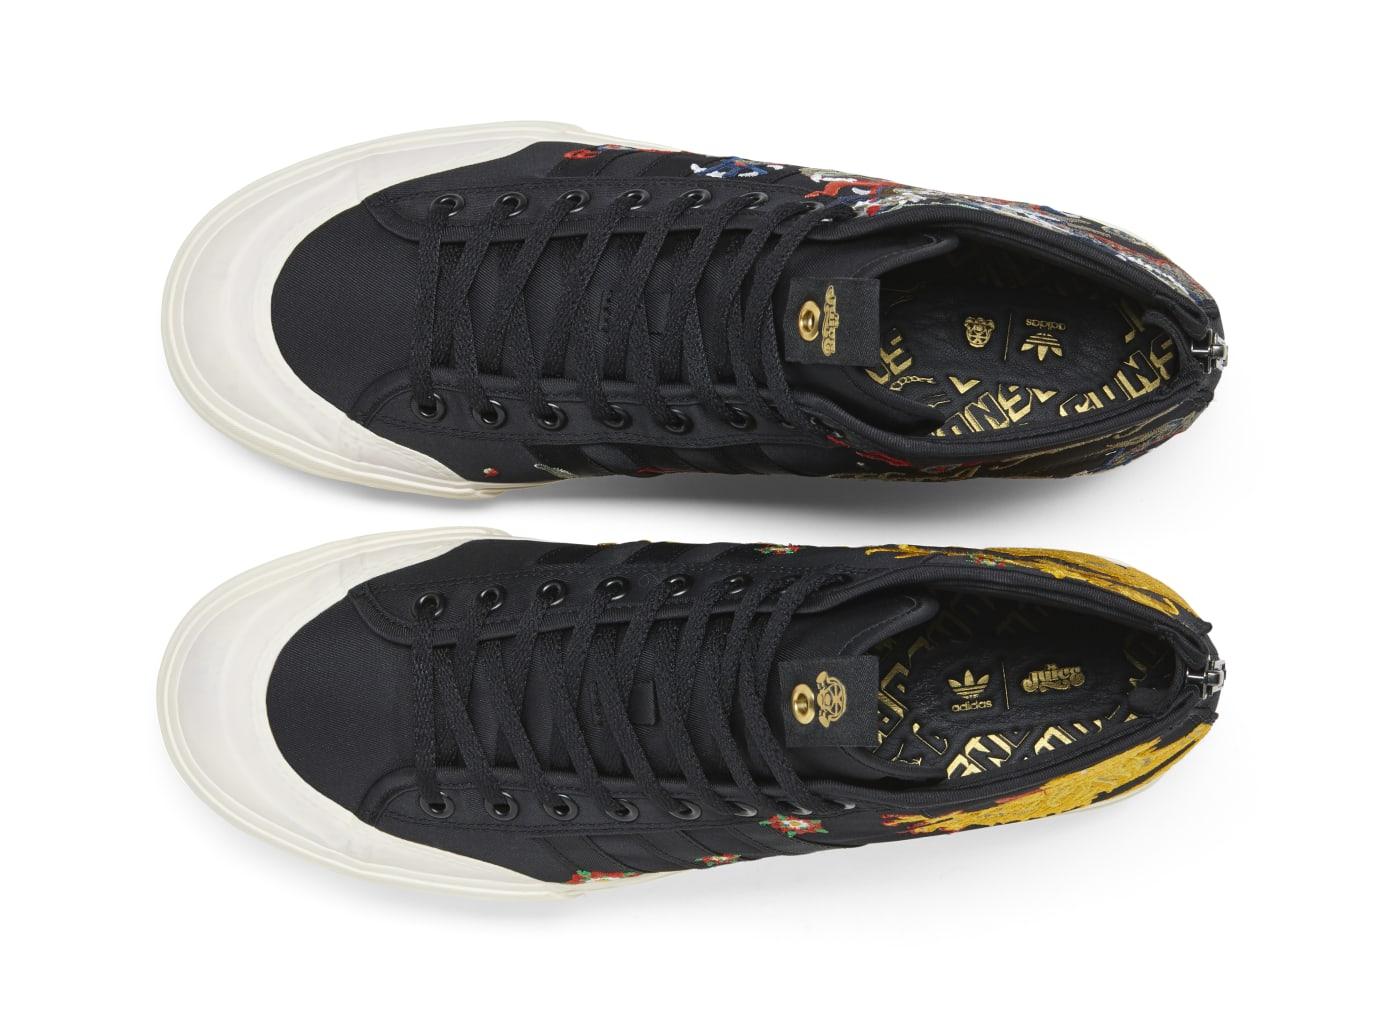 premium selection a616f 36562 Image via Adidas Adidas Consortium Juice x foot Patrol Matchcourt Mid  CM7877 (Top)